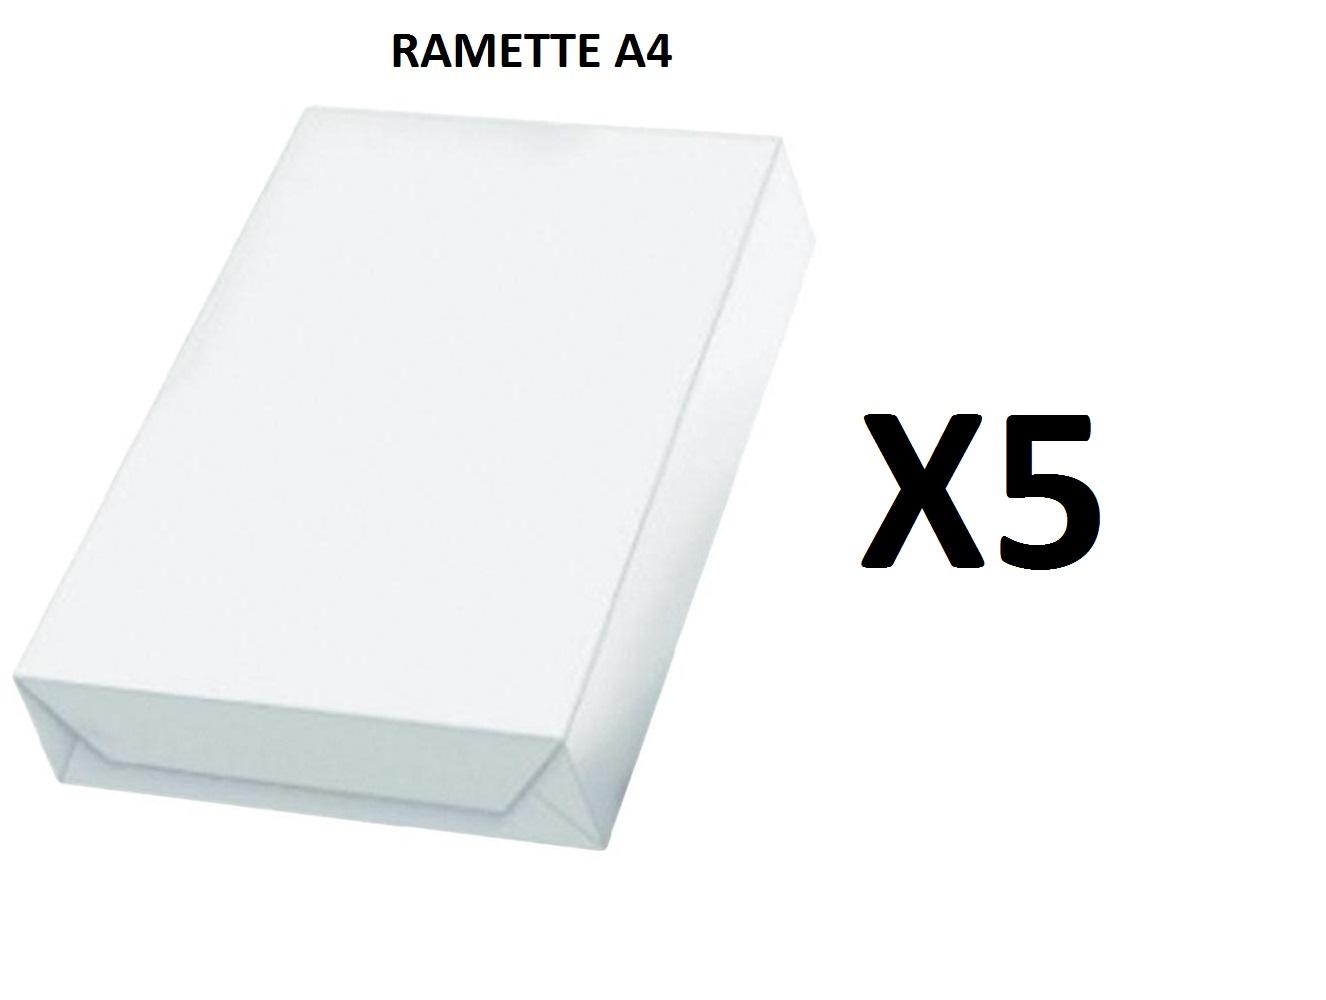 Ramette Papier A4 - 80Grs - Blanc - 500 Feuilles - X05